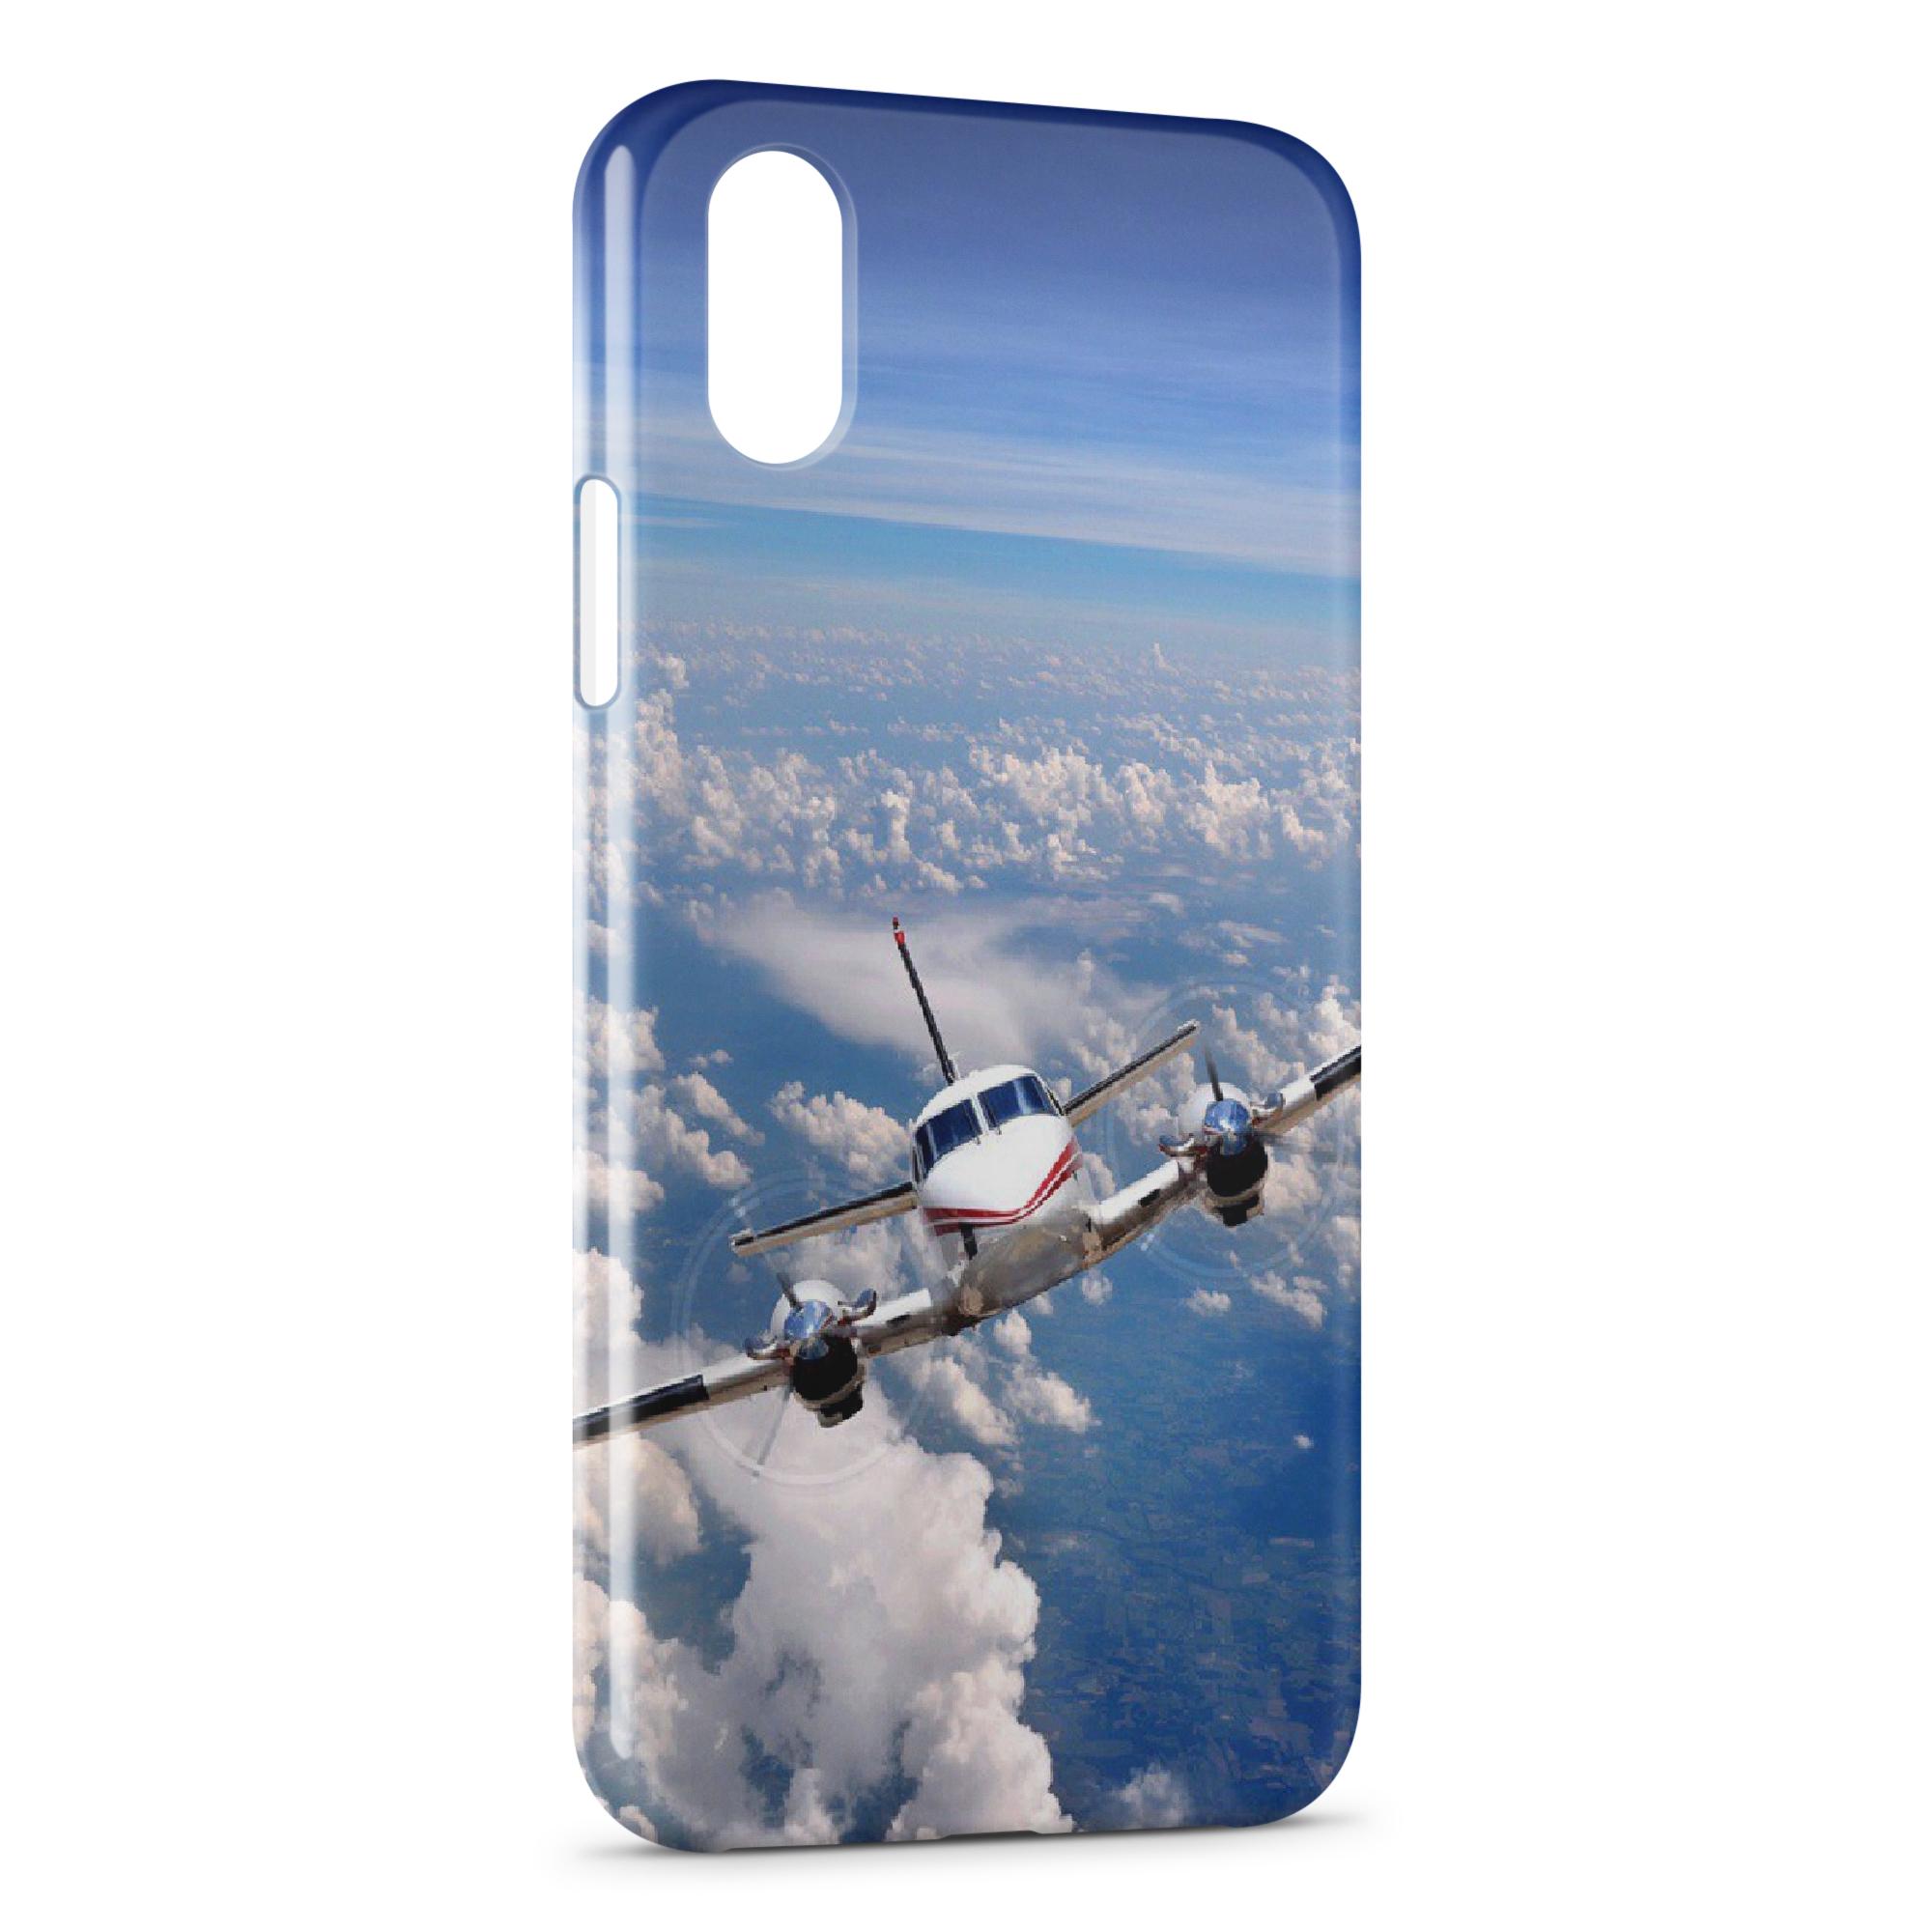 coque iphone 6 millitaire avion